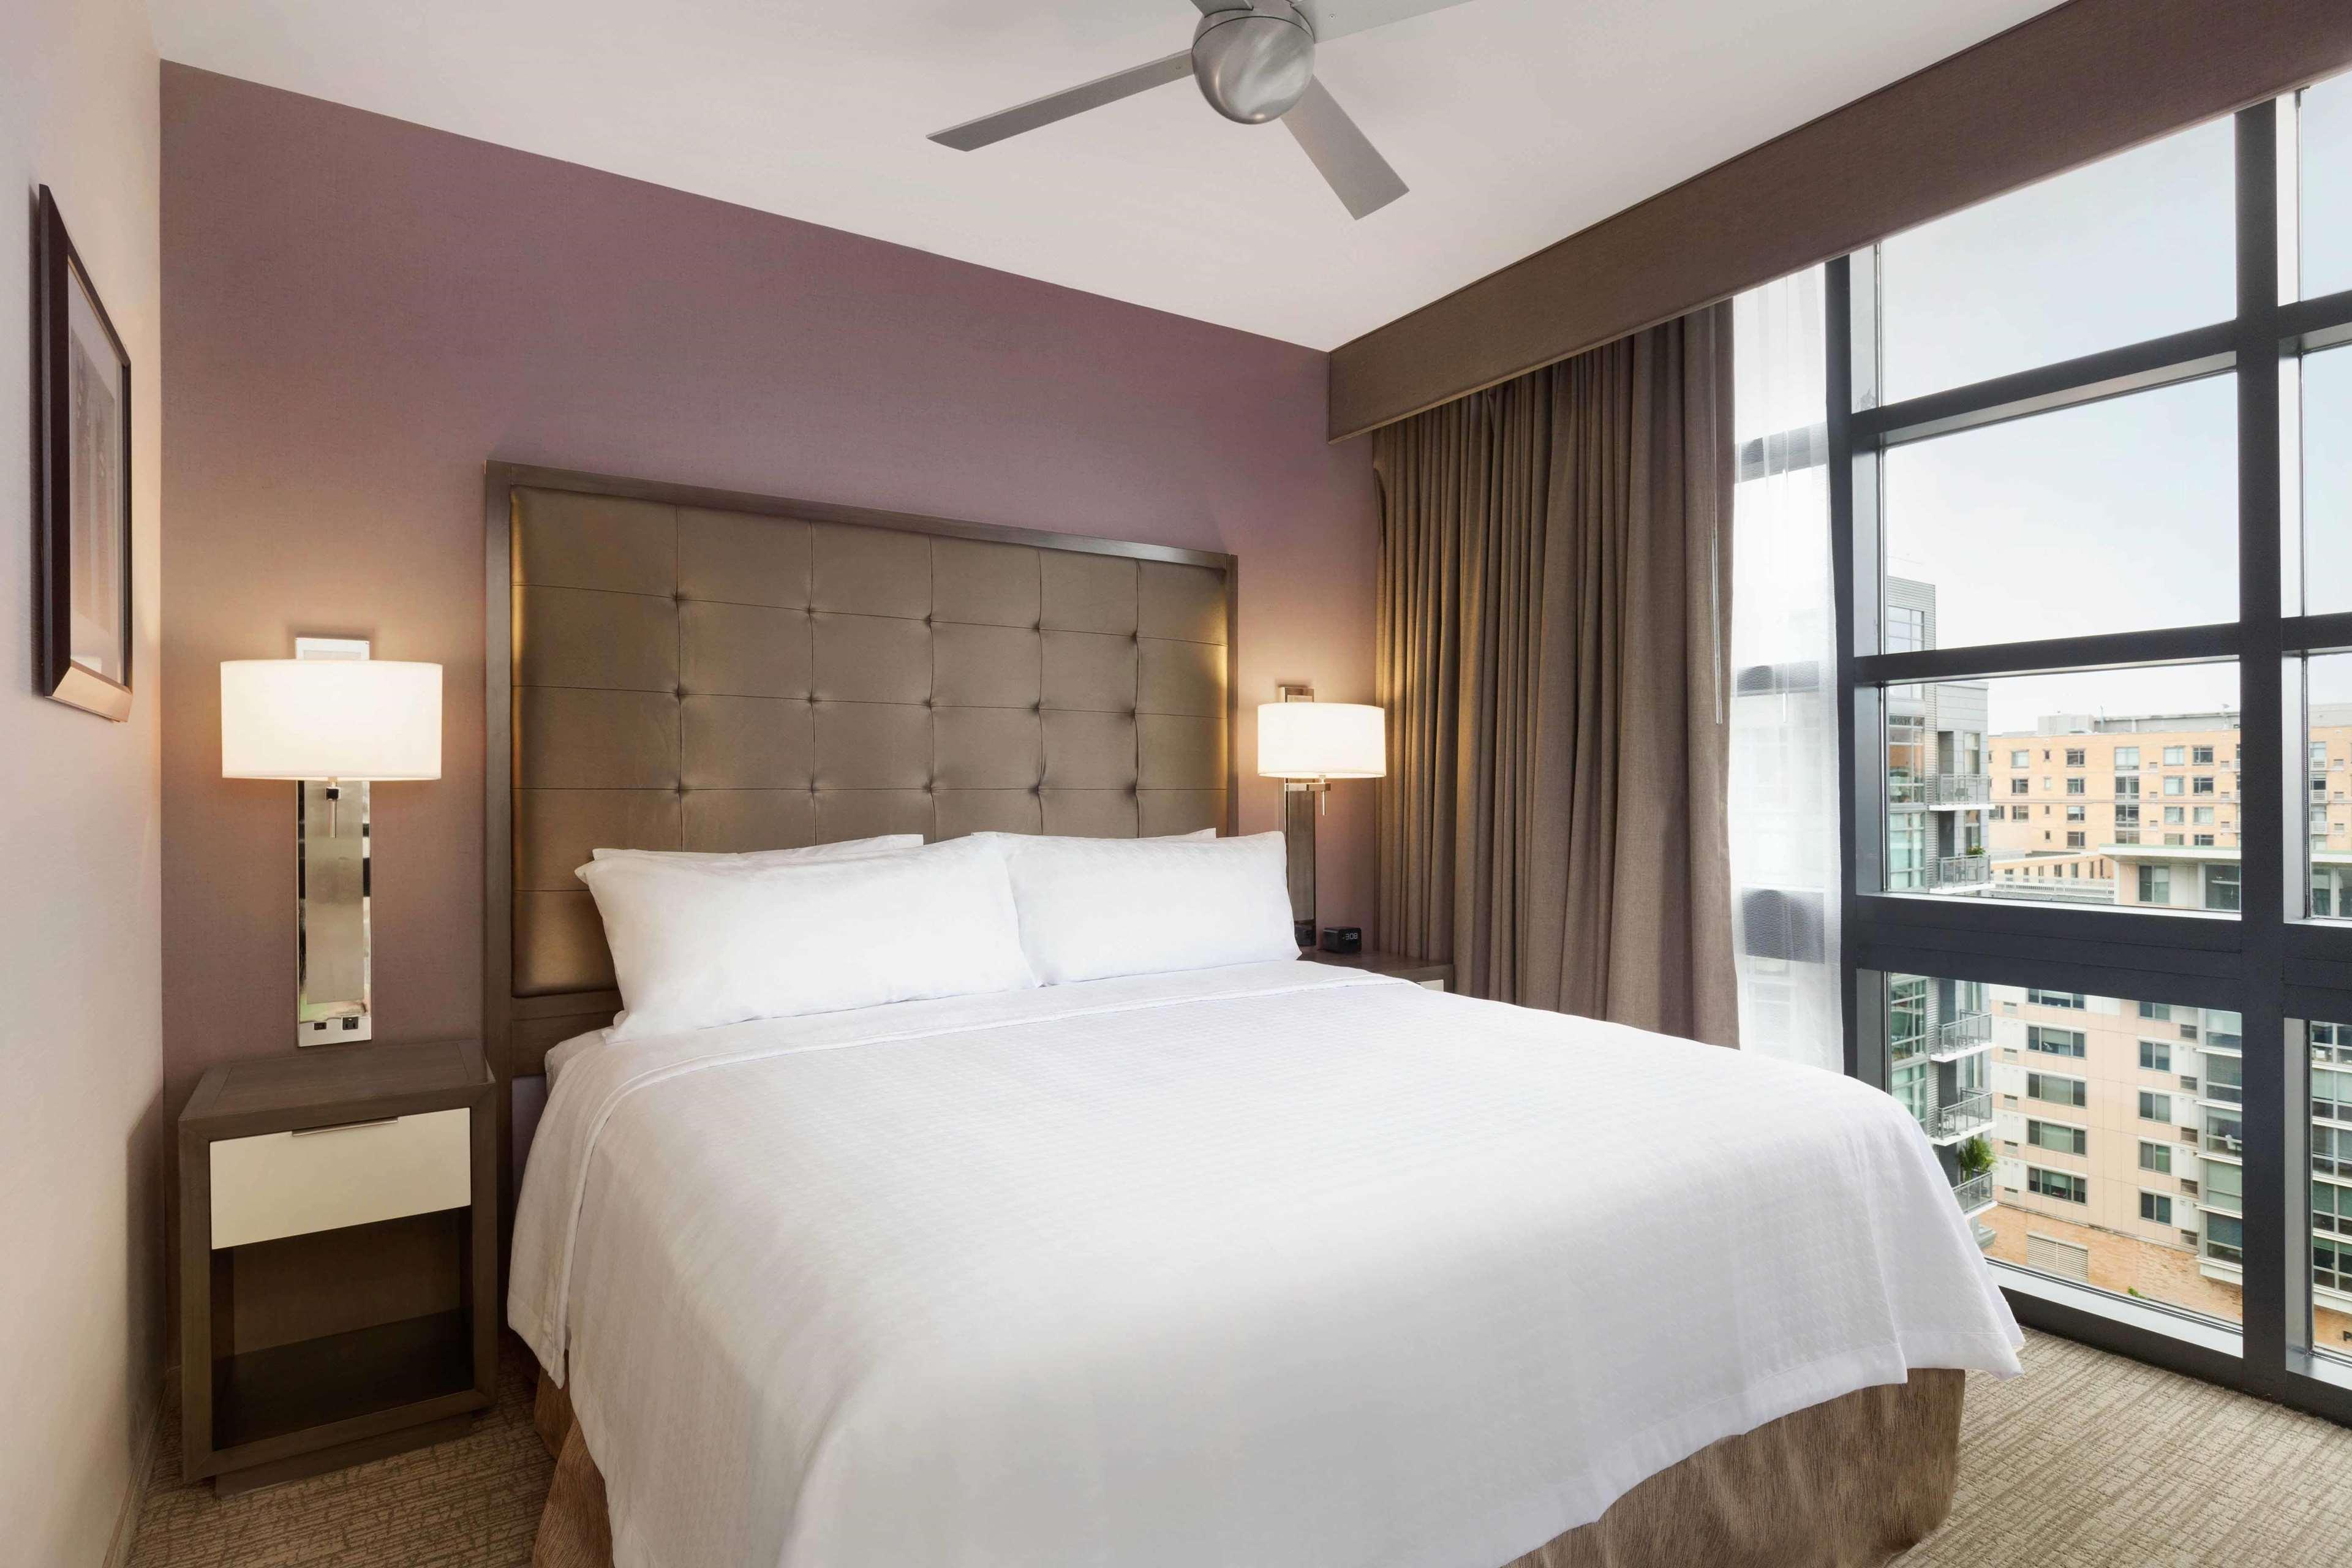 Homewood Suites by Hilton Washington DC Convention Center image 20